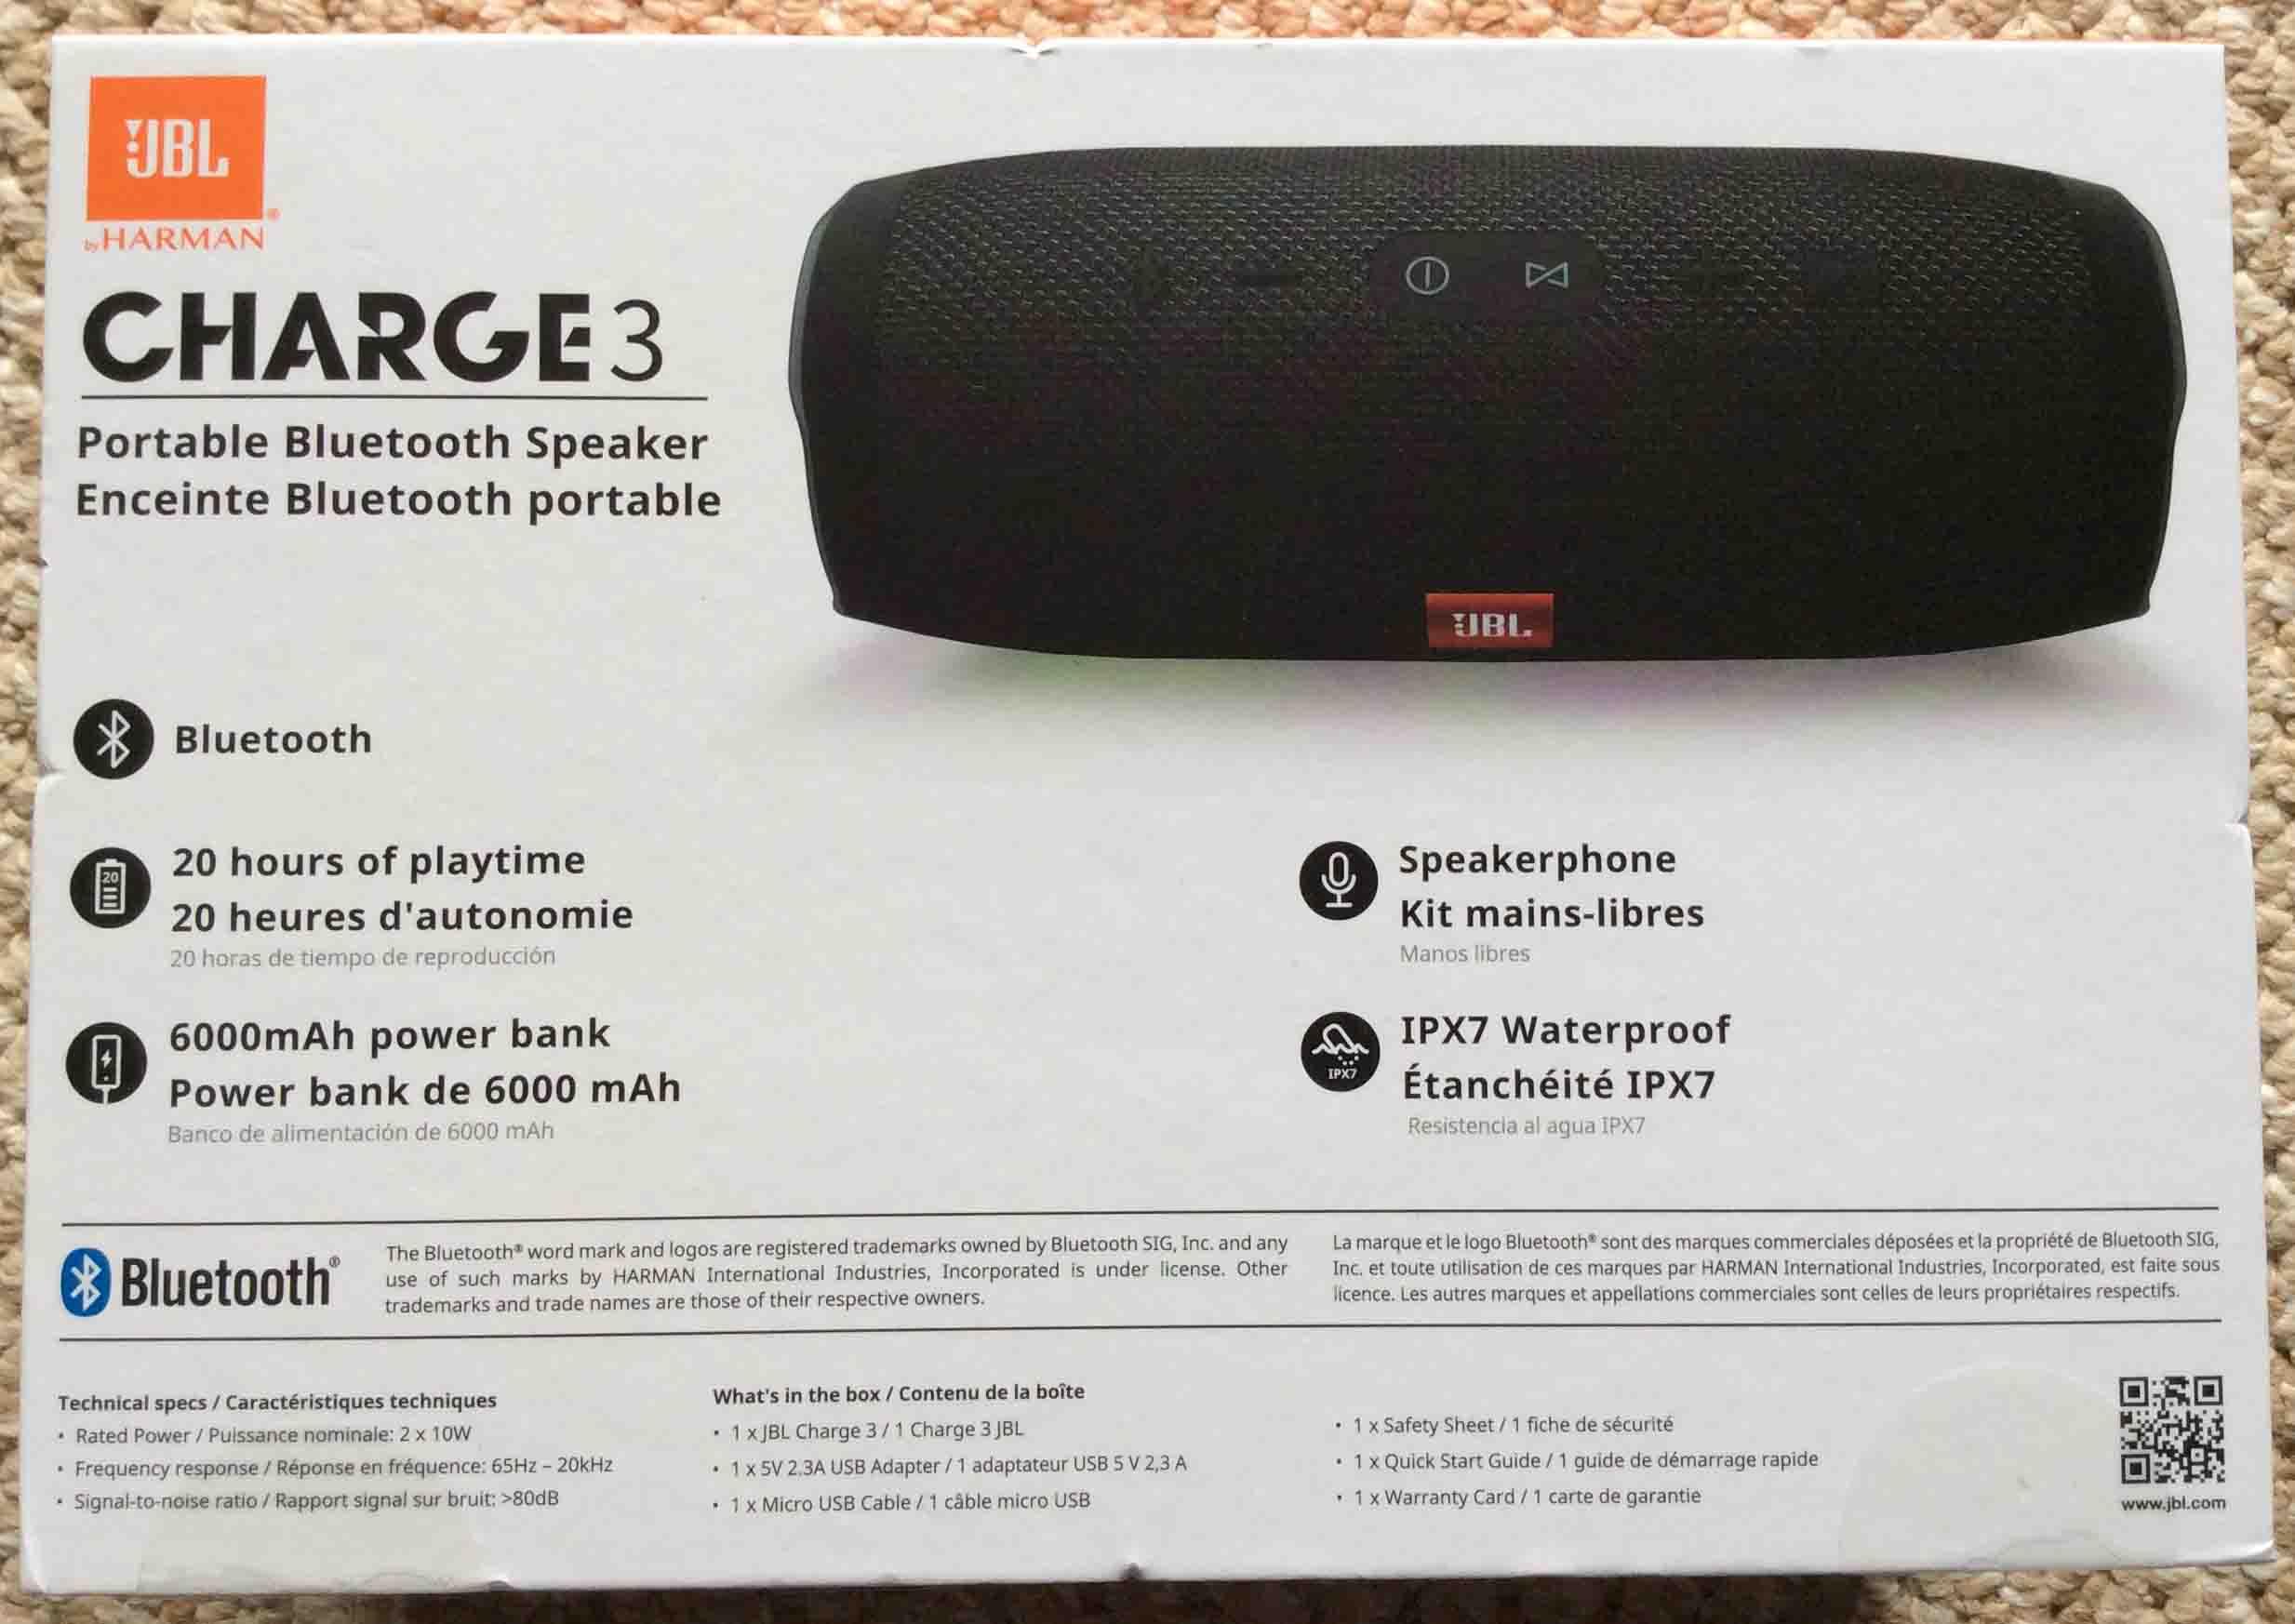 Jbl Charge 3 Waterproof Wireless Bluetooth Speaker Picture Gallery